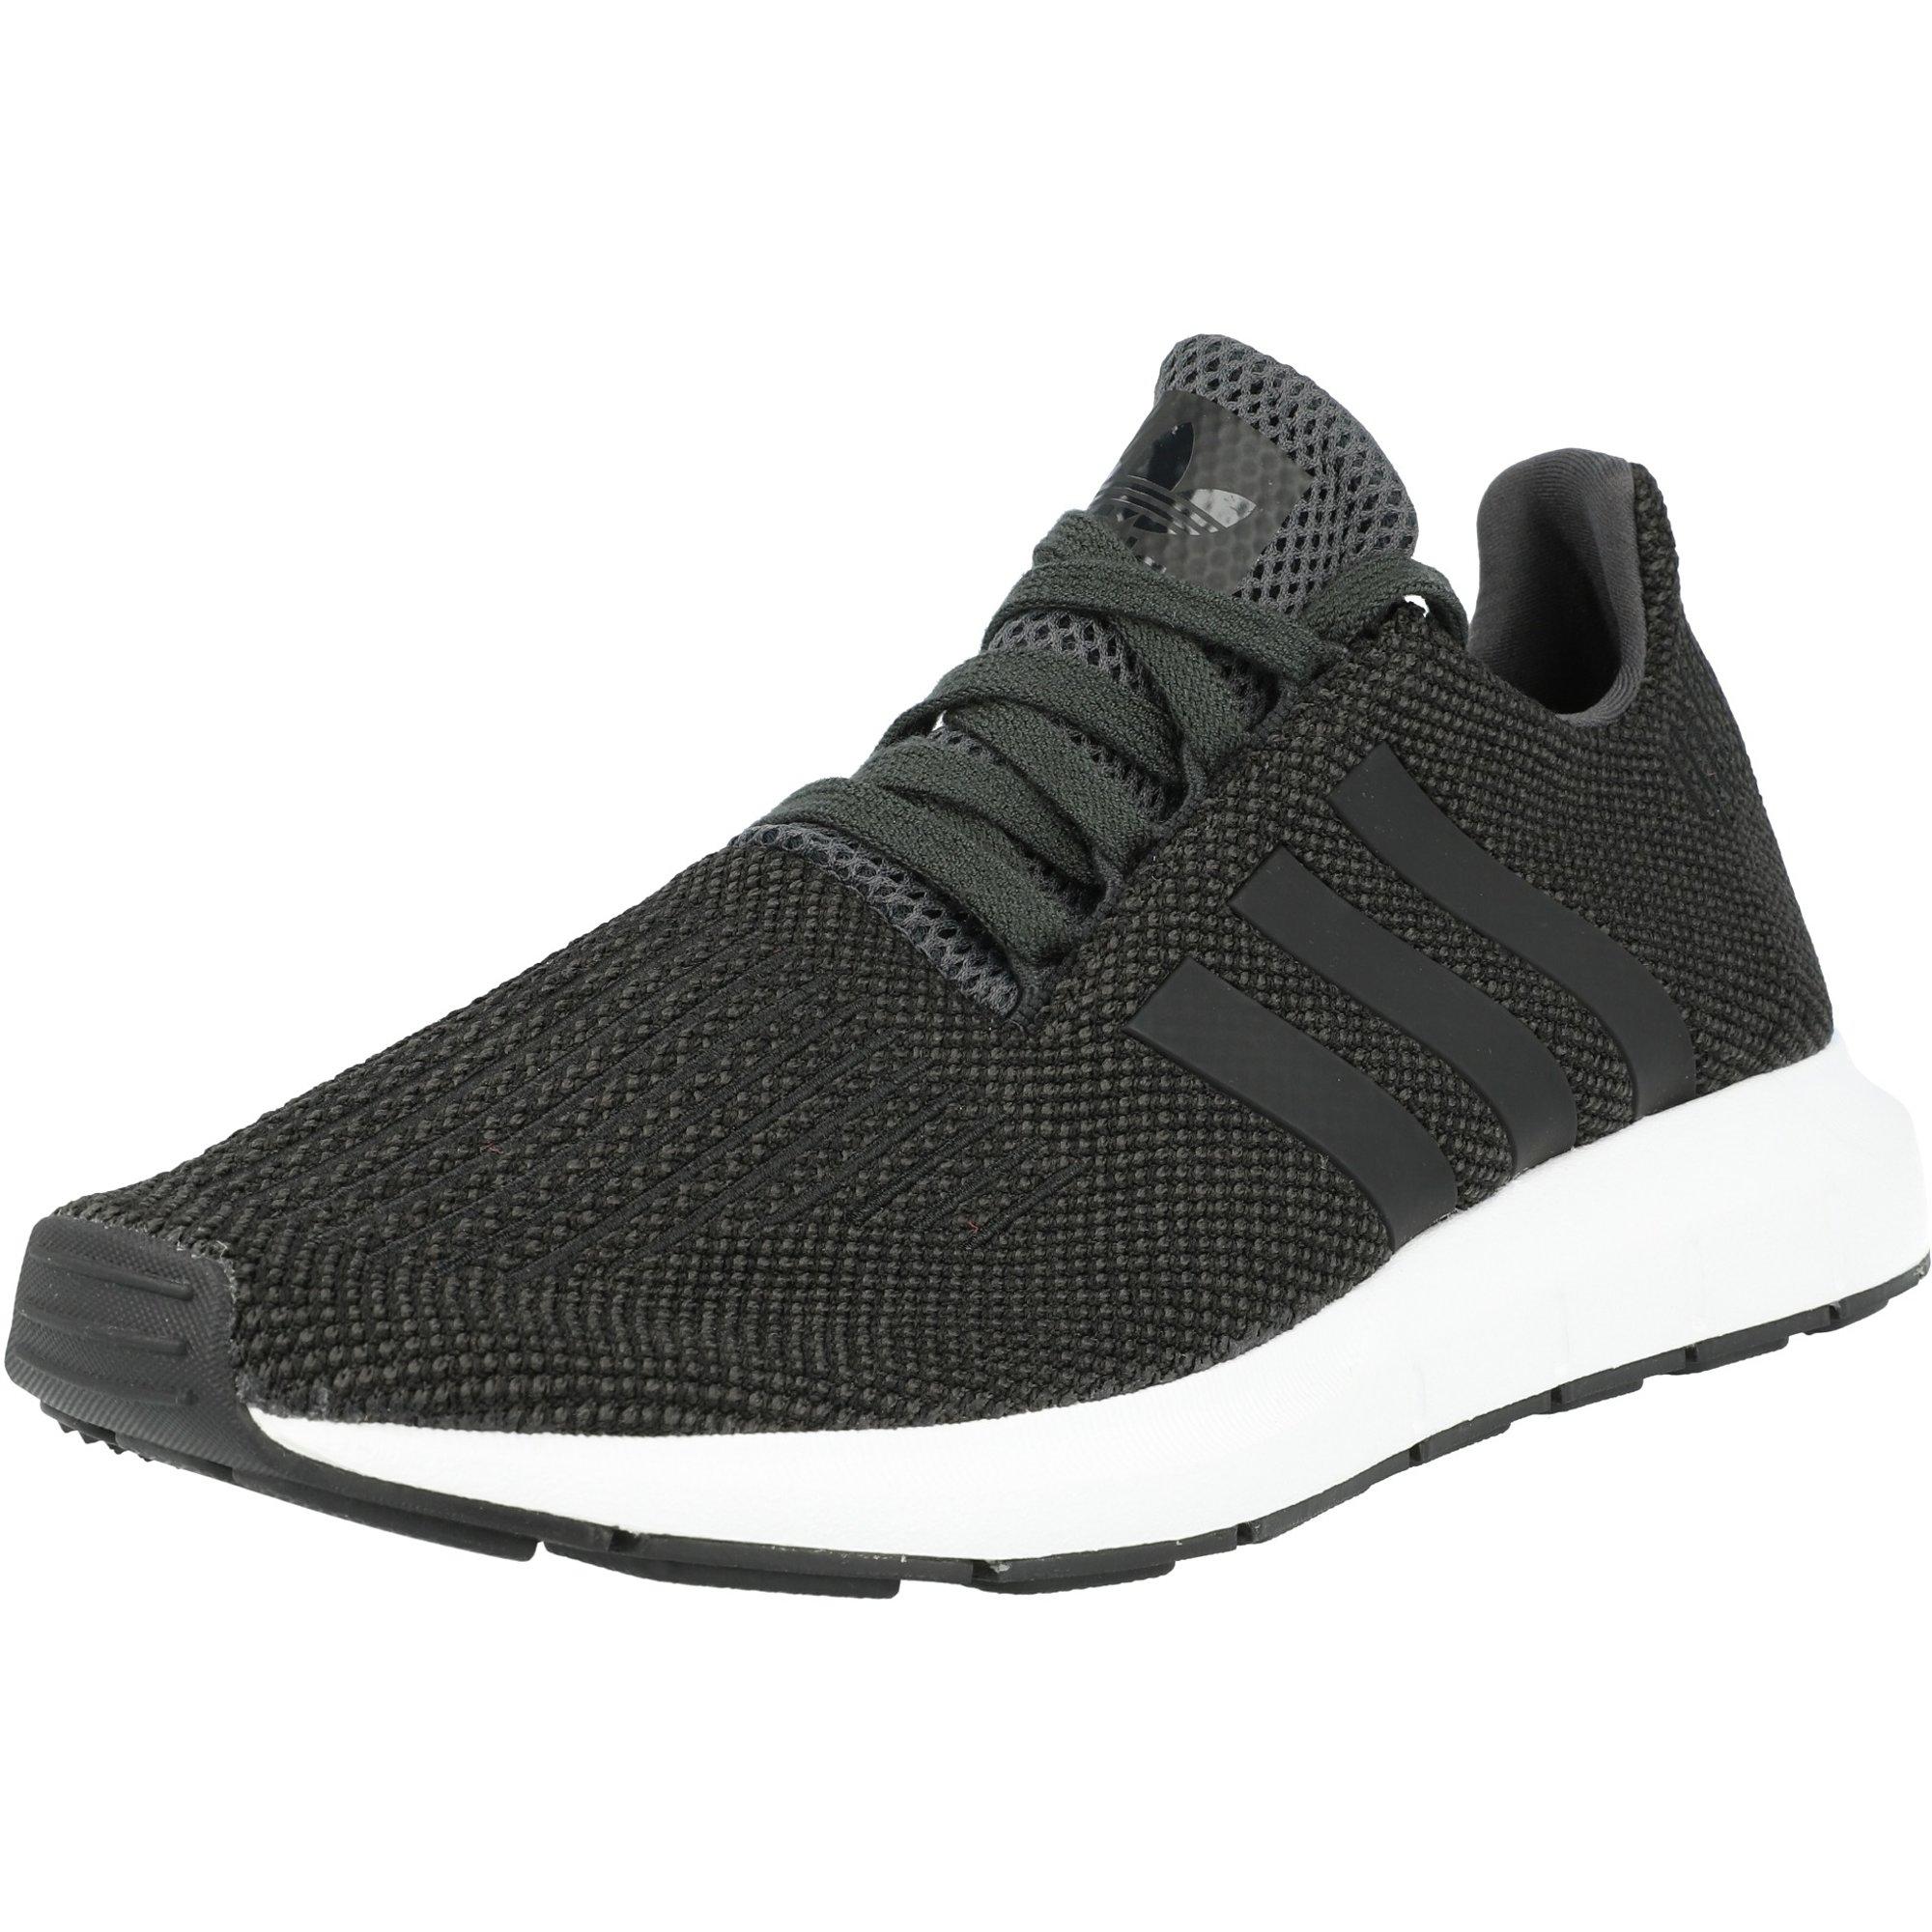 adidas Originals Swift Run Carbon/Black